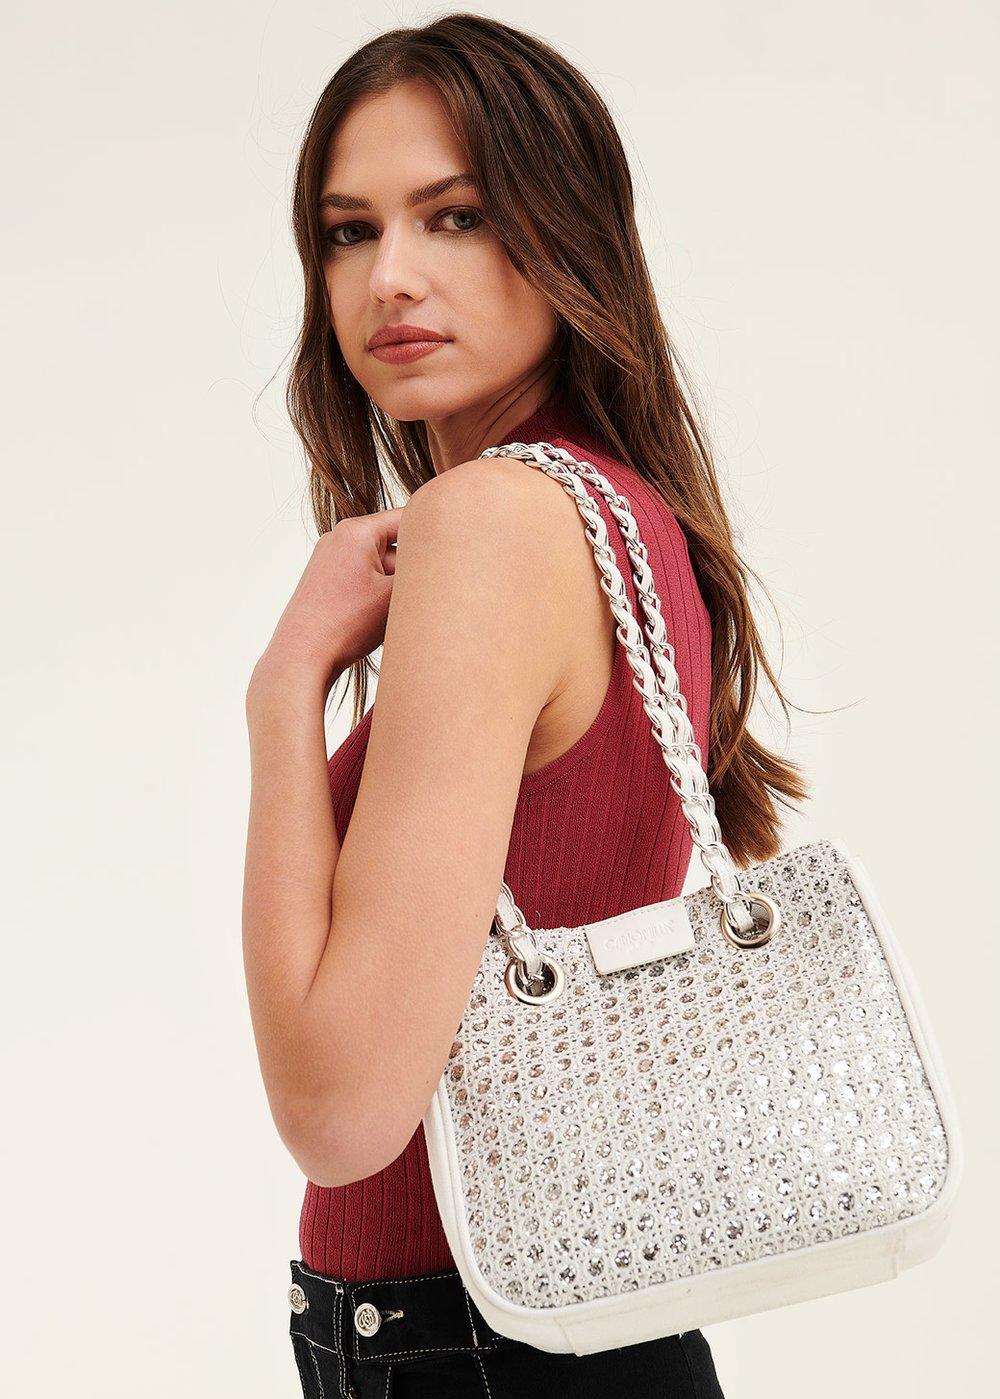 Bayr shopping bag with lurex - White / Silver - Woman